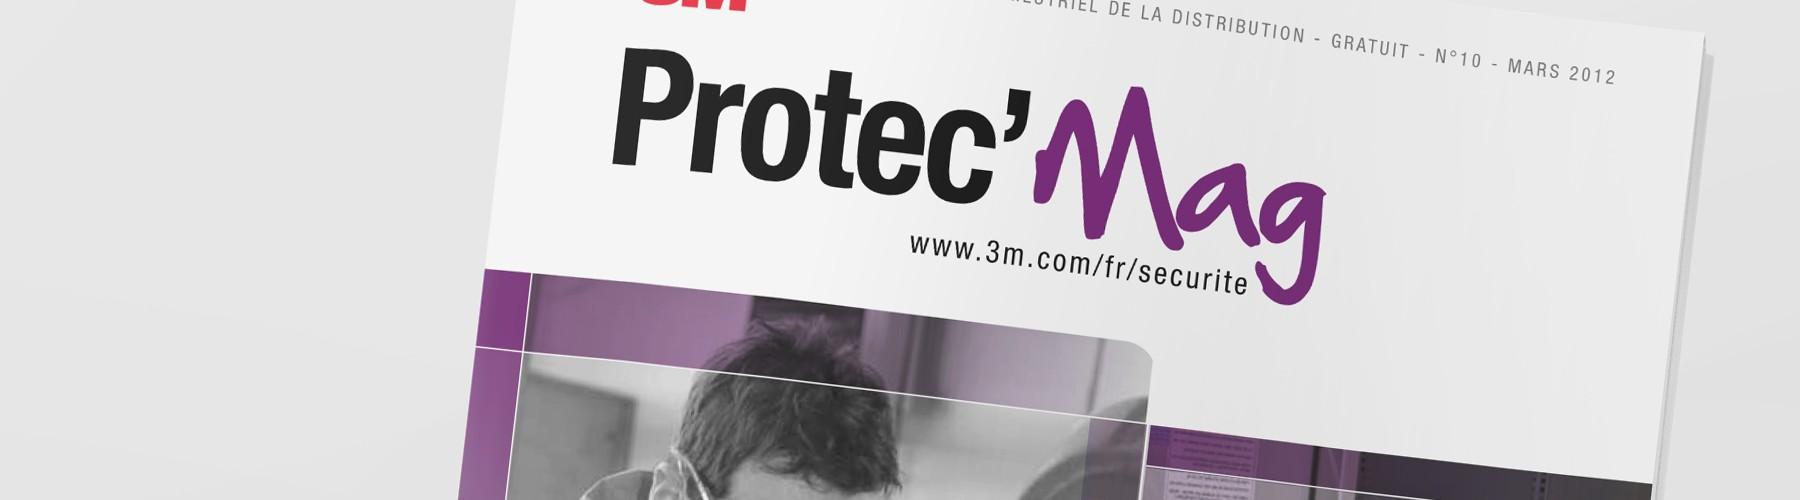 3M protectmag header